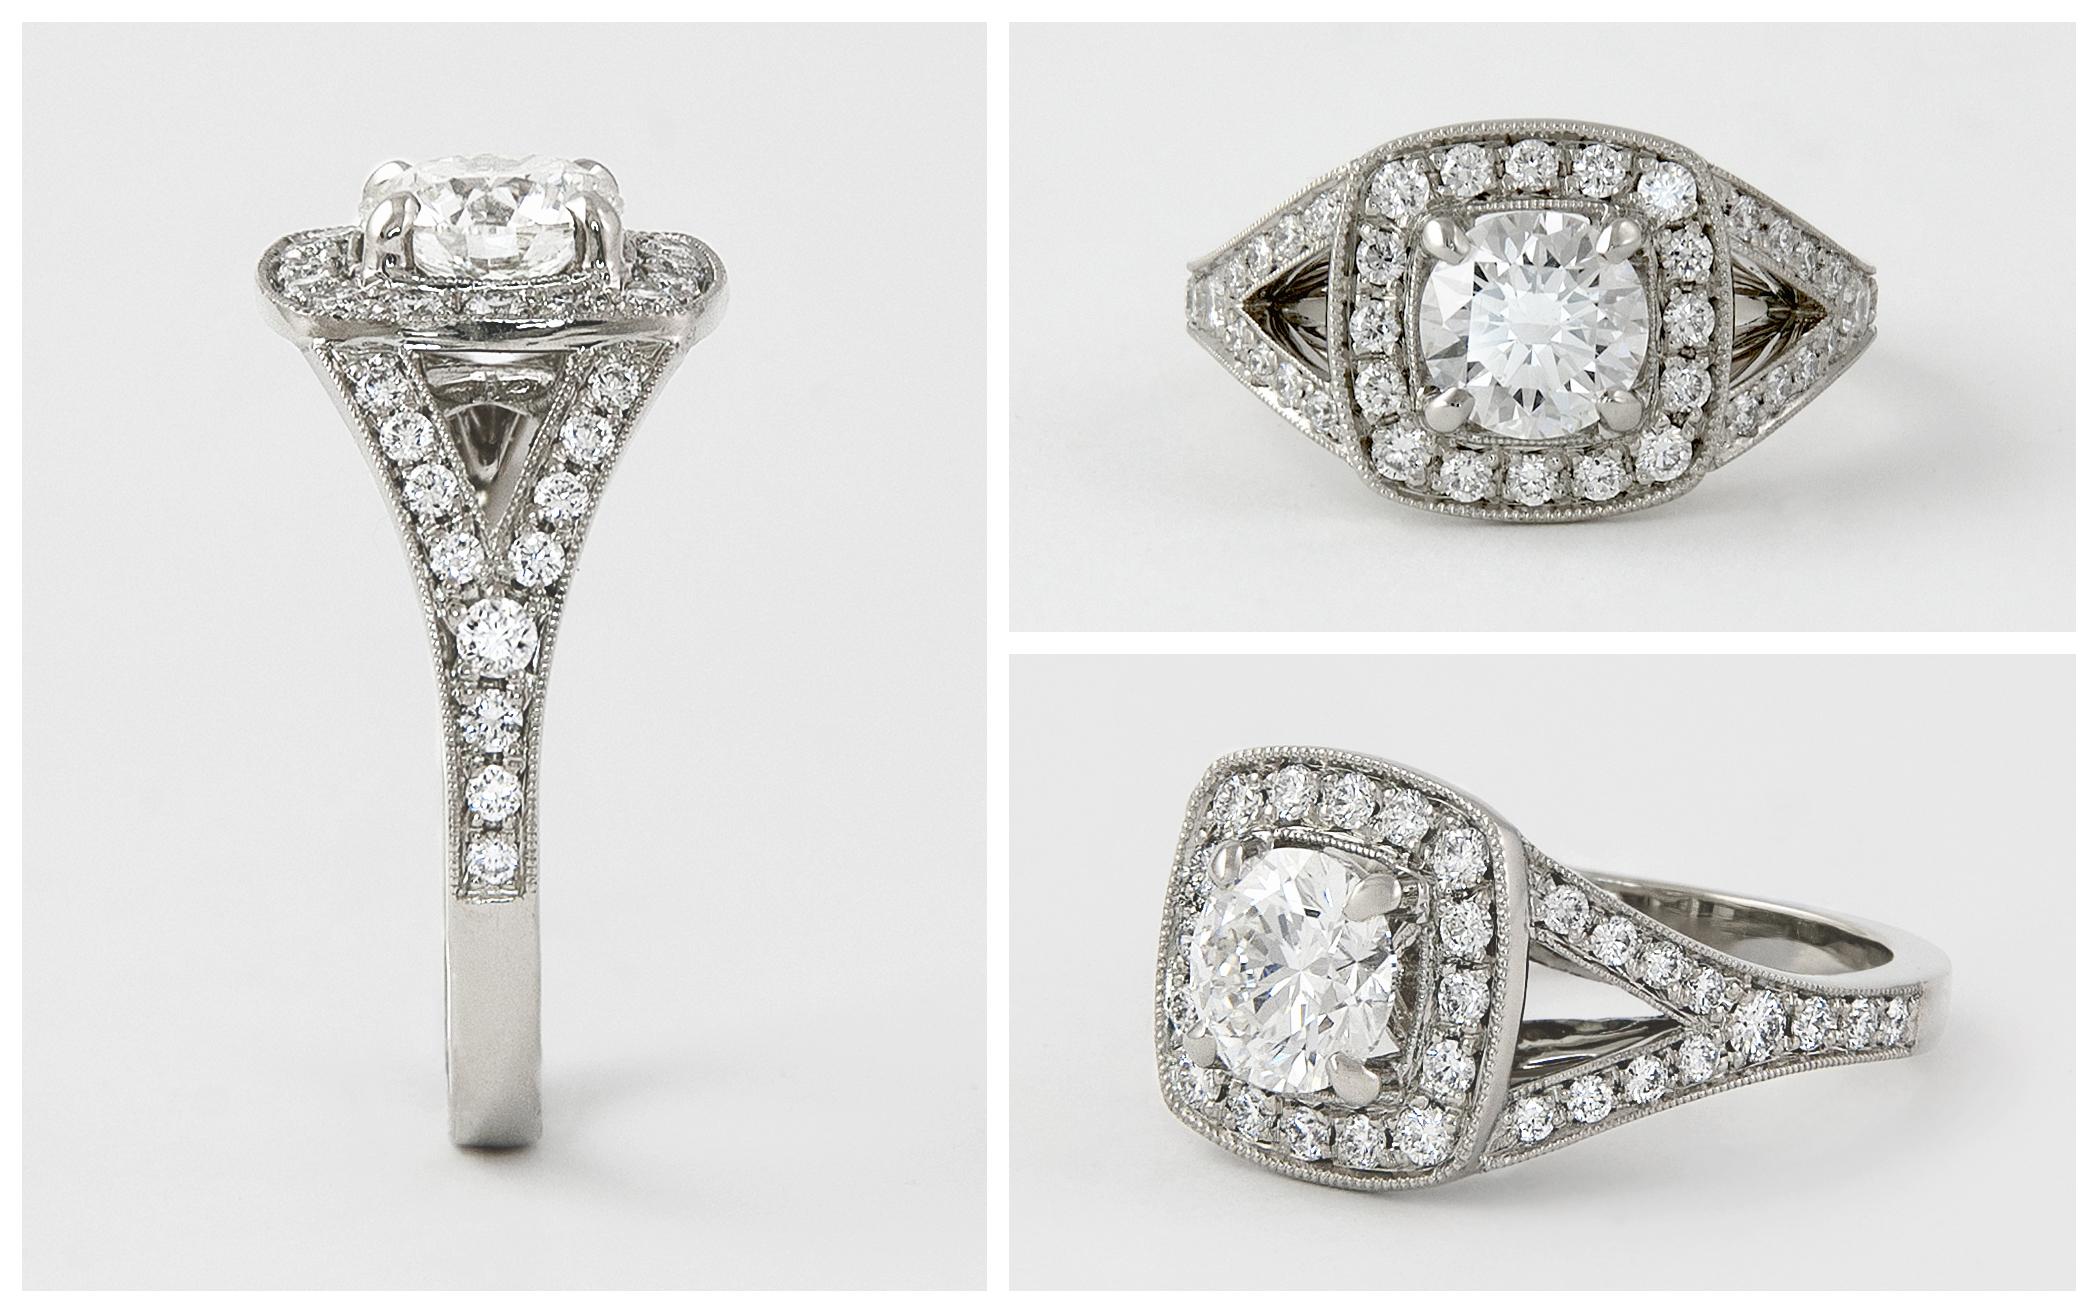 Diamond Halo Split Shank Ring with 1 carat Center